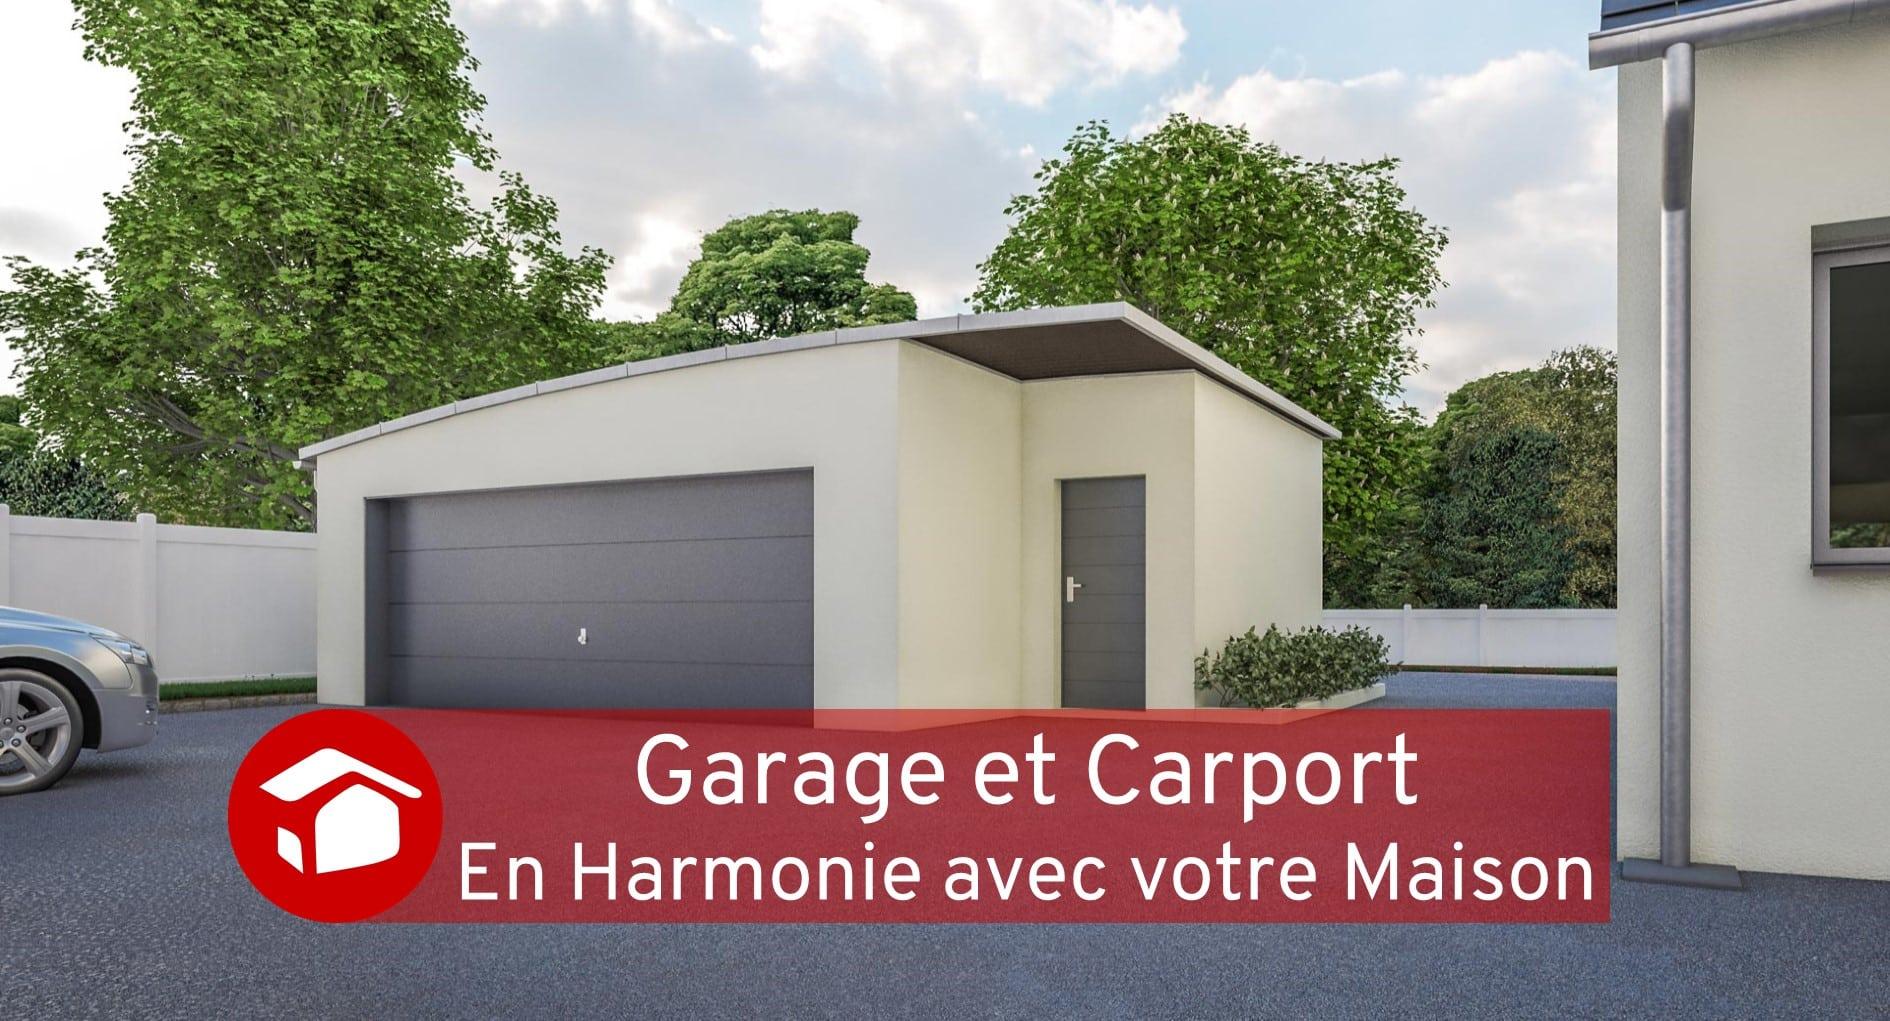 Garage Carport CourtierTravaux Meilleur Projet